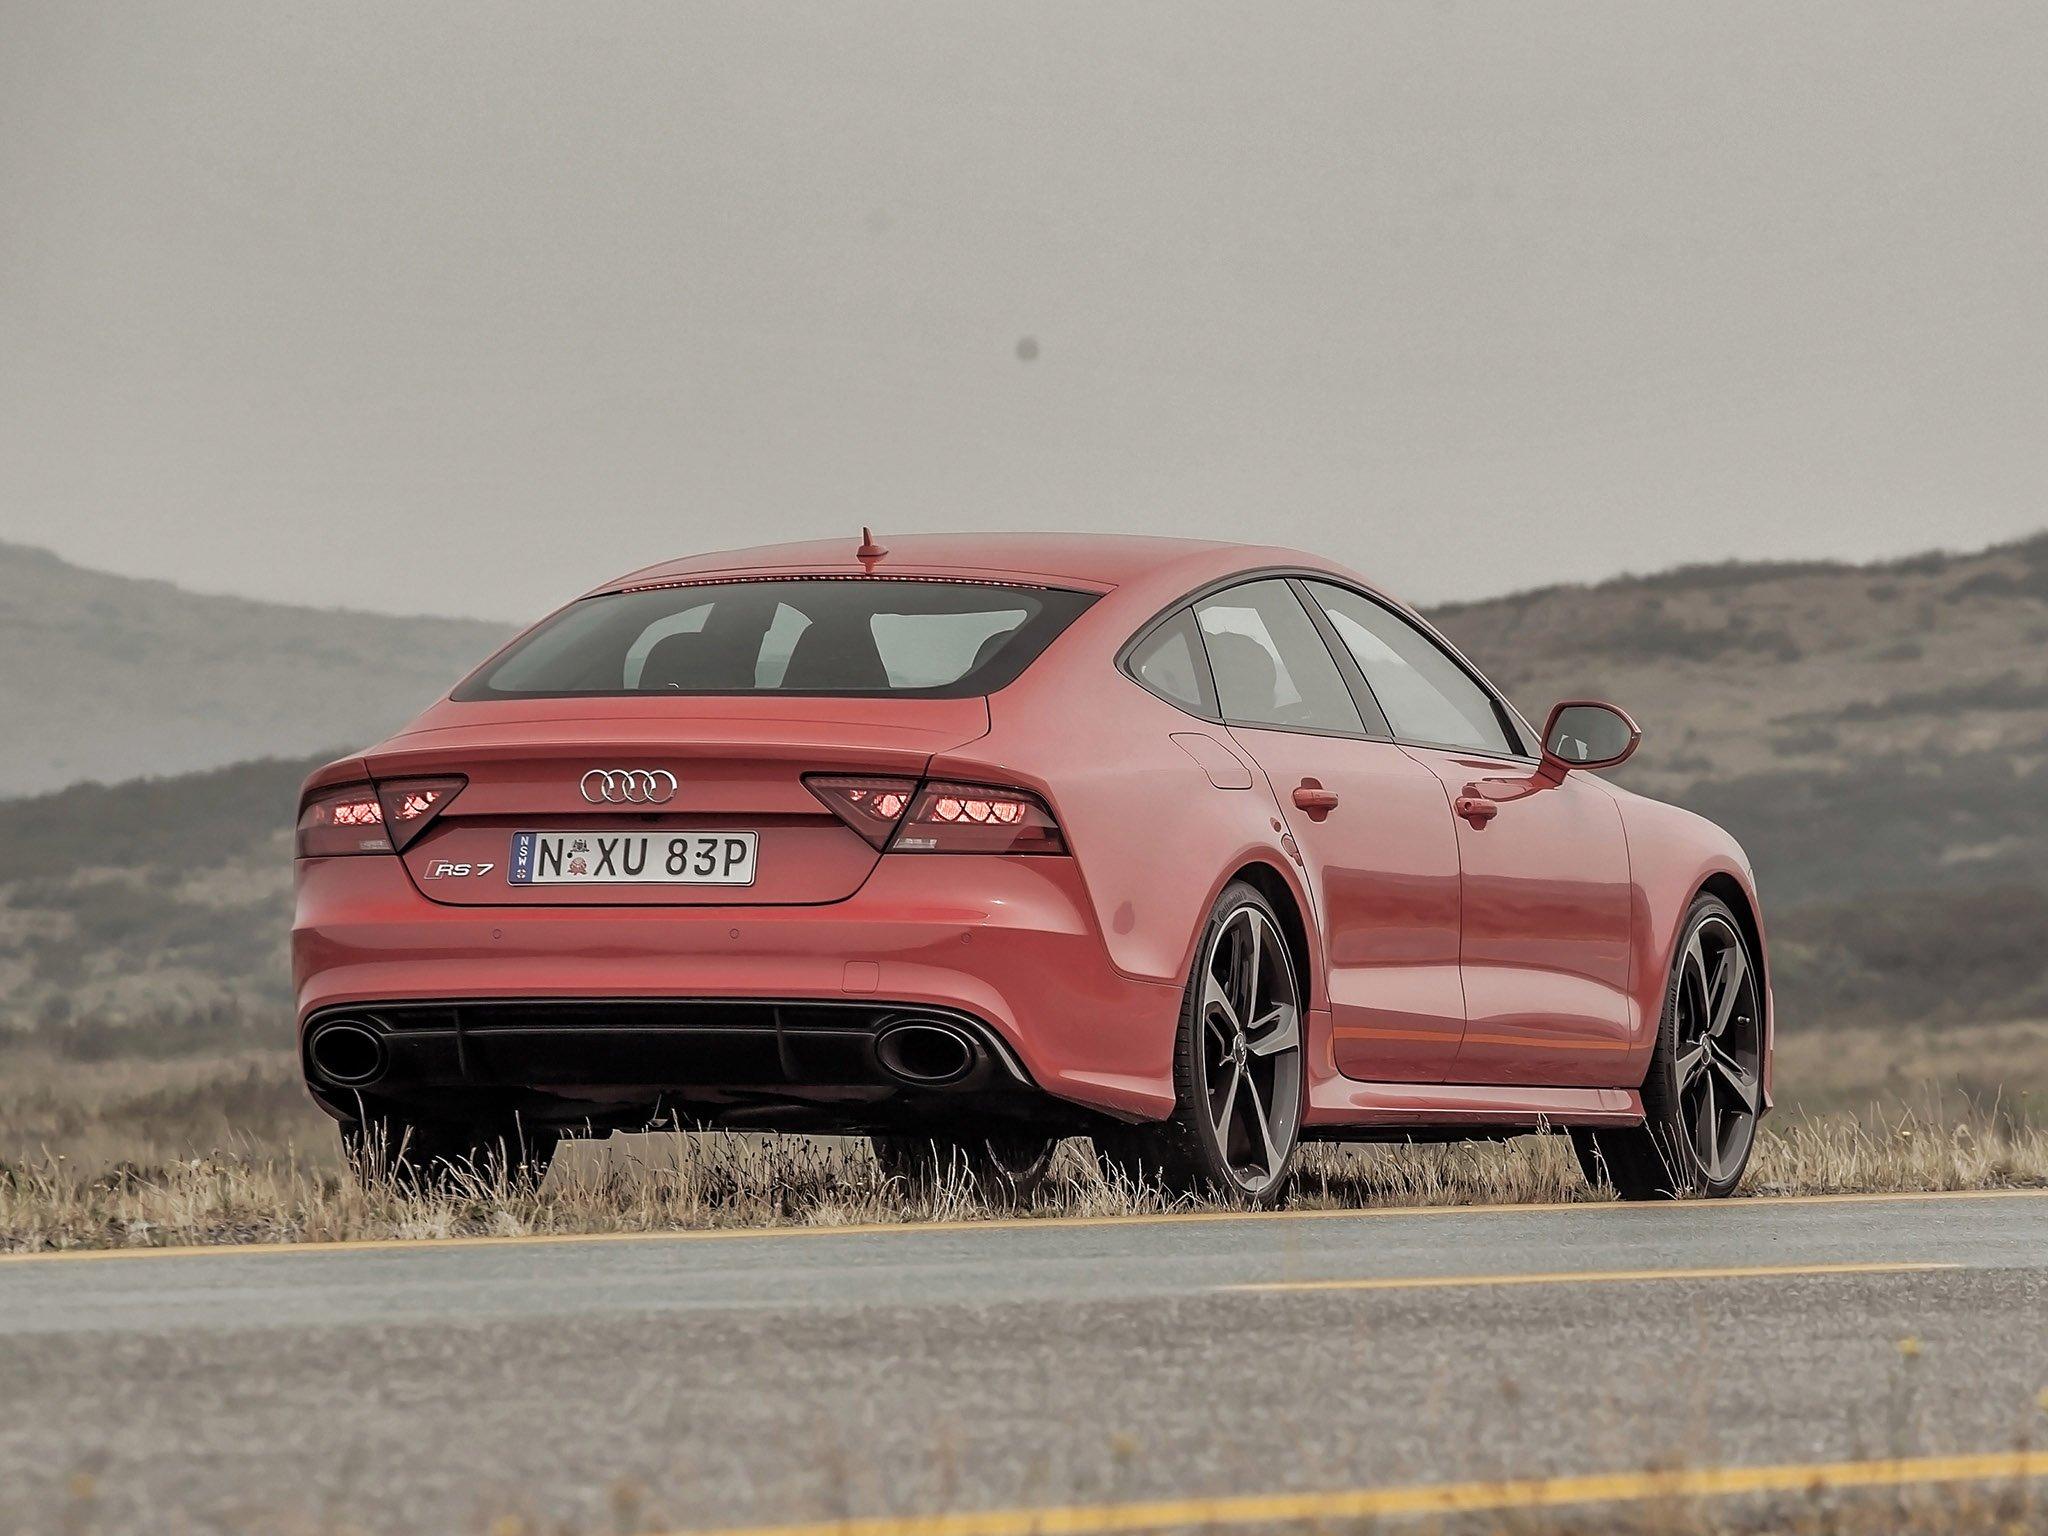 Audi Rs7 Sportback Wallpaper 2048x1536 384638